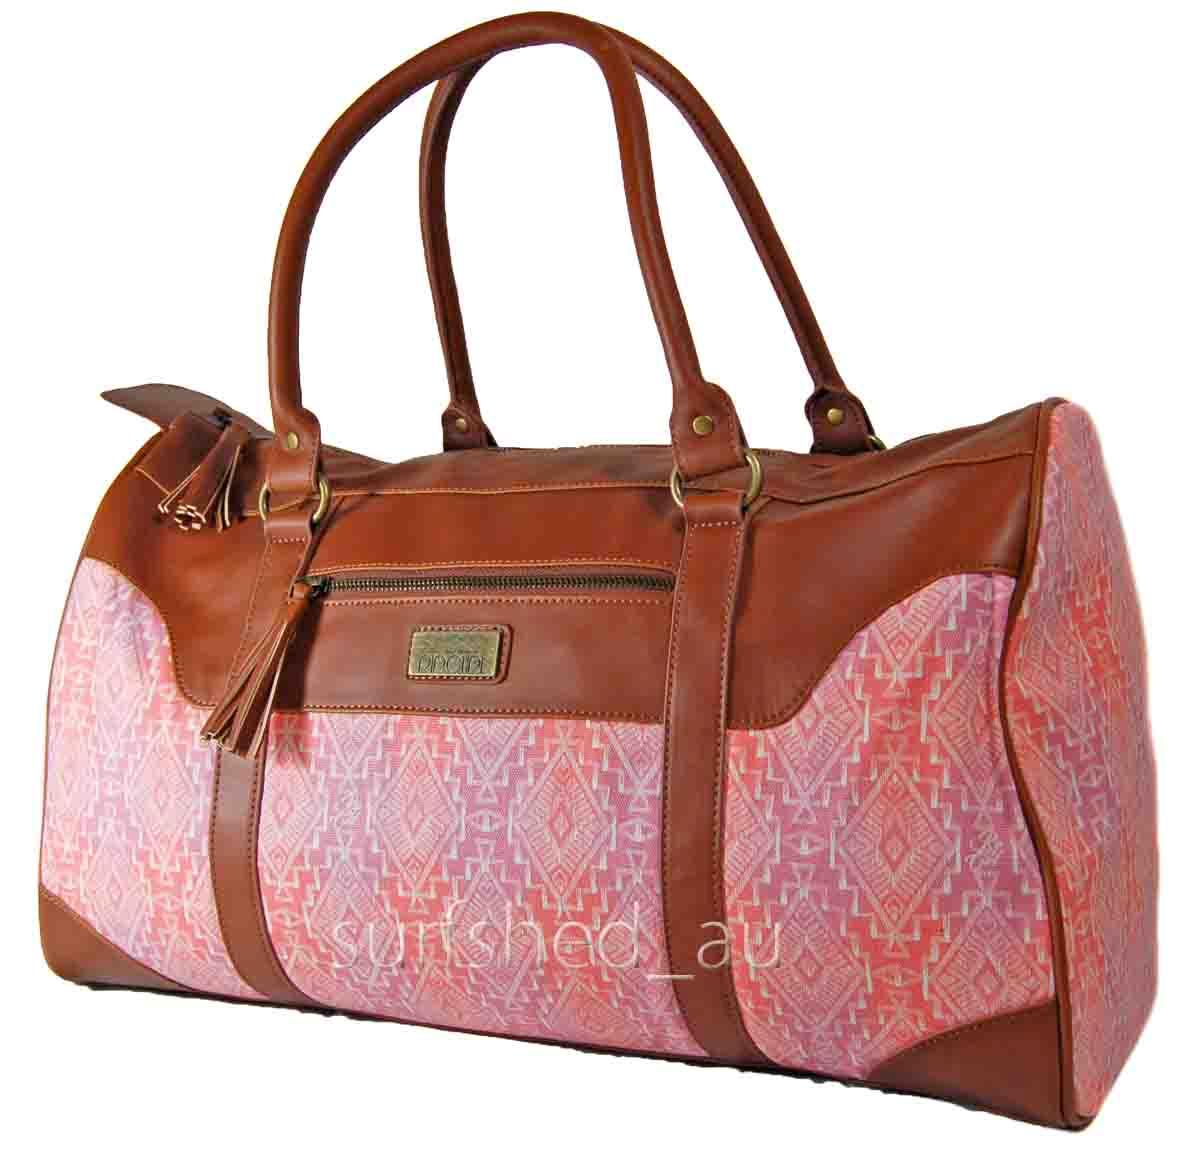 Luxury  WomensLargeShoulderWeekendMaternityOvernightTravelHoldallBag